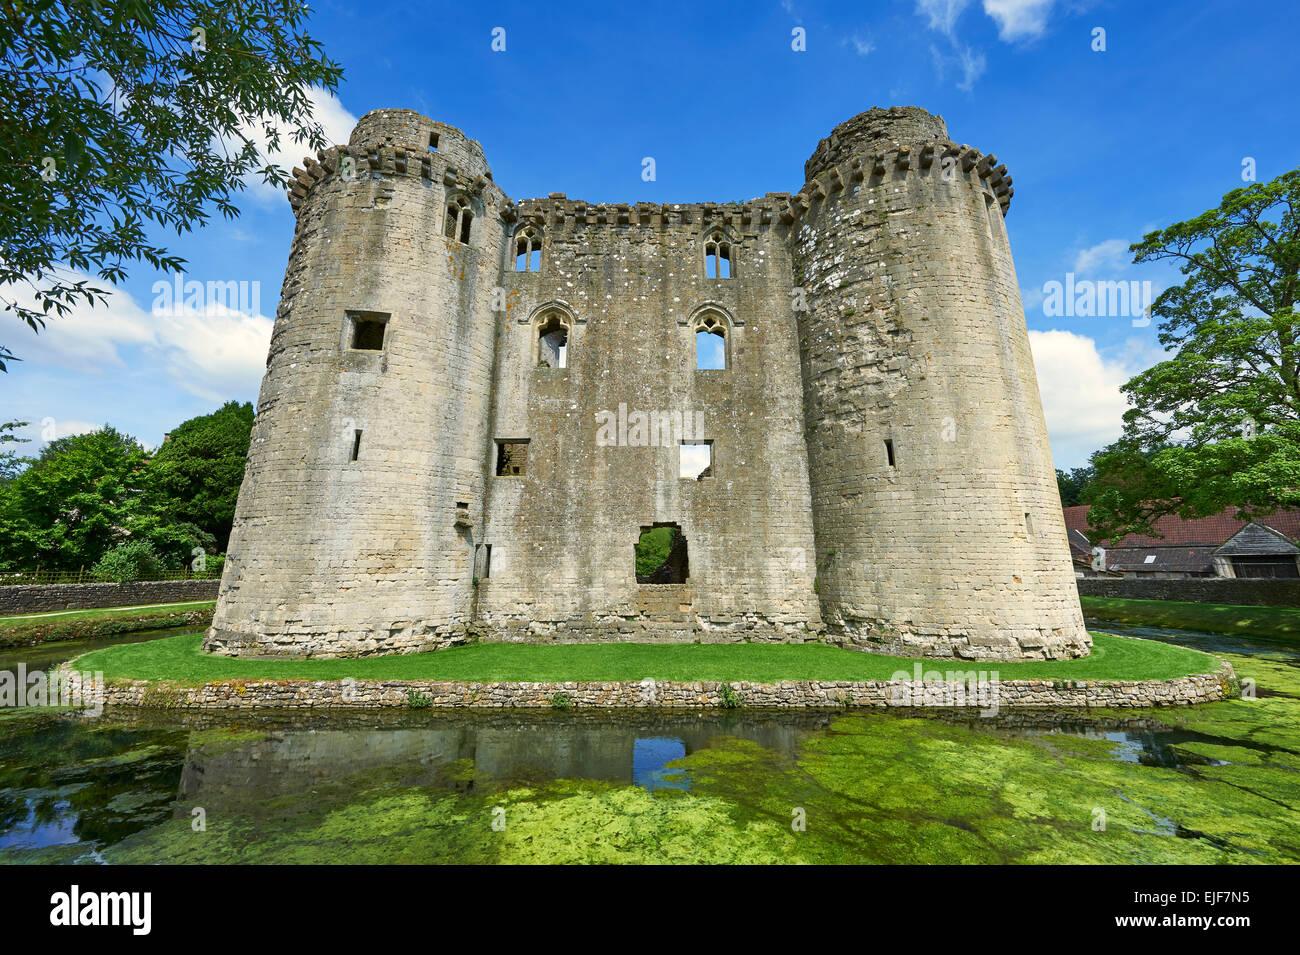 Nunney medieval moated castle, Nunney, Somerset England Stock Photo